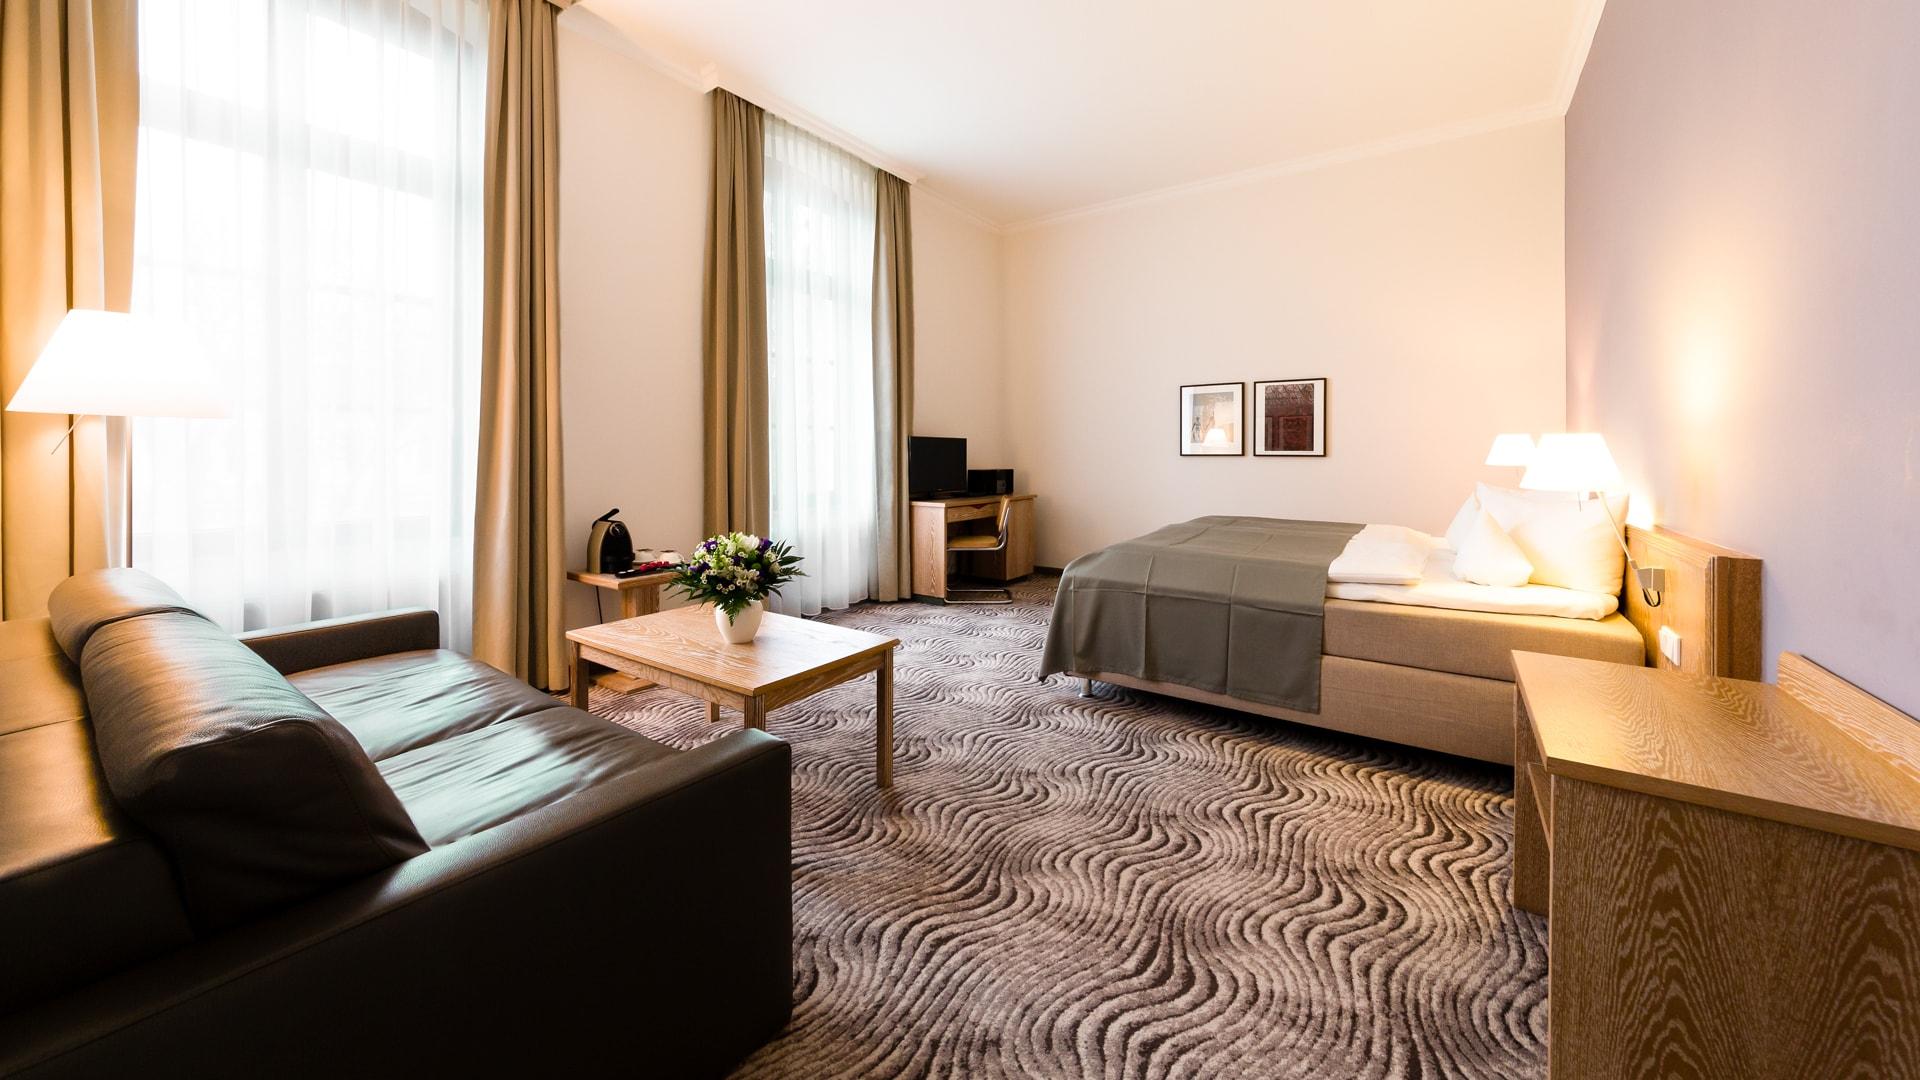 13 Michels_Hotels_Thalassohotel_Nordseehaus_Doppelzimmer_Comfort